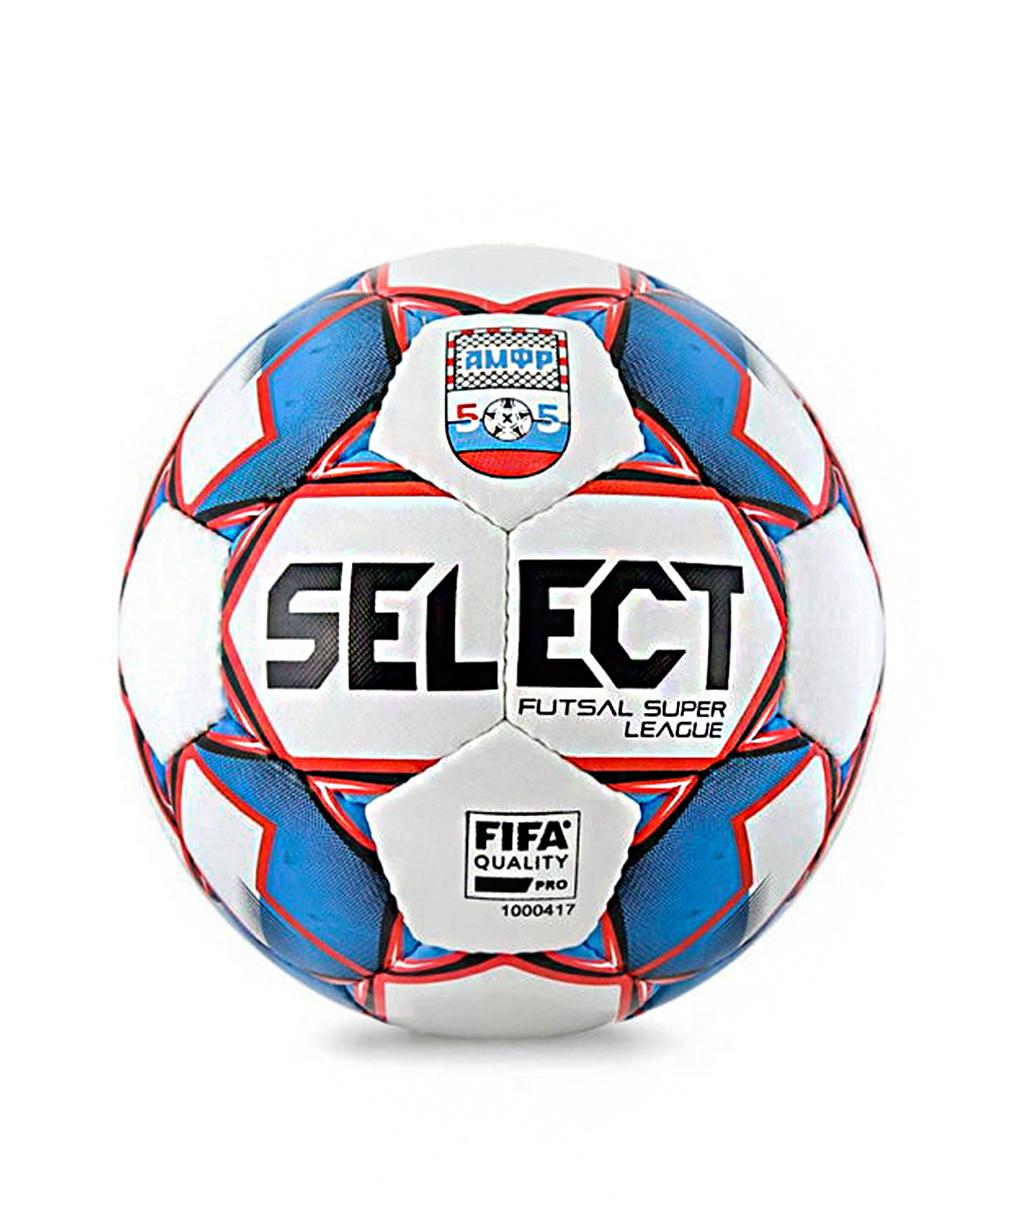 Купить мяч Select Super League АМФР РФС FIFA 850718 (Размер 4)